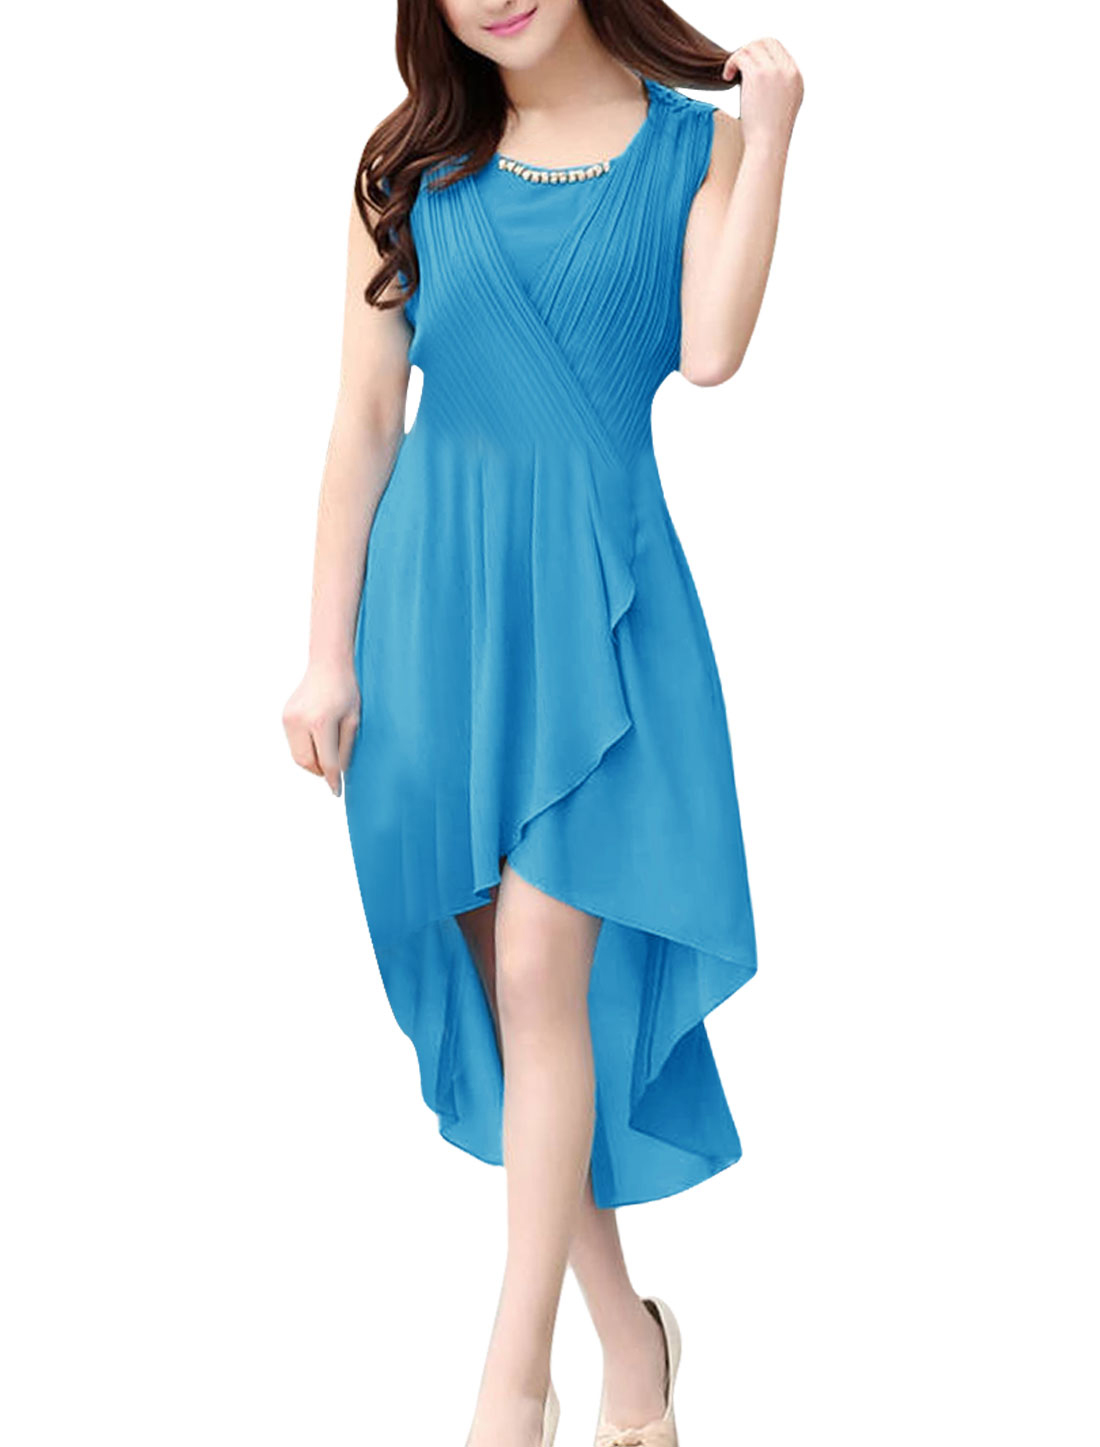 Woman Chic Fake Diamond Chain Decor Low-High Hem Design Sea Blue Dress XS